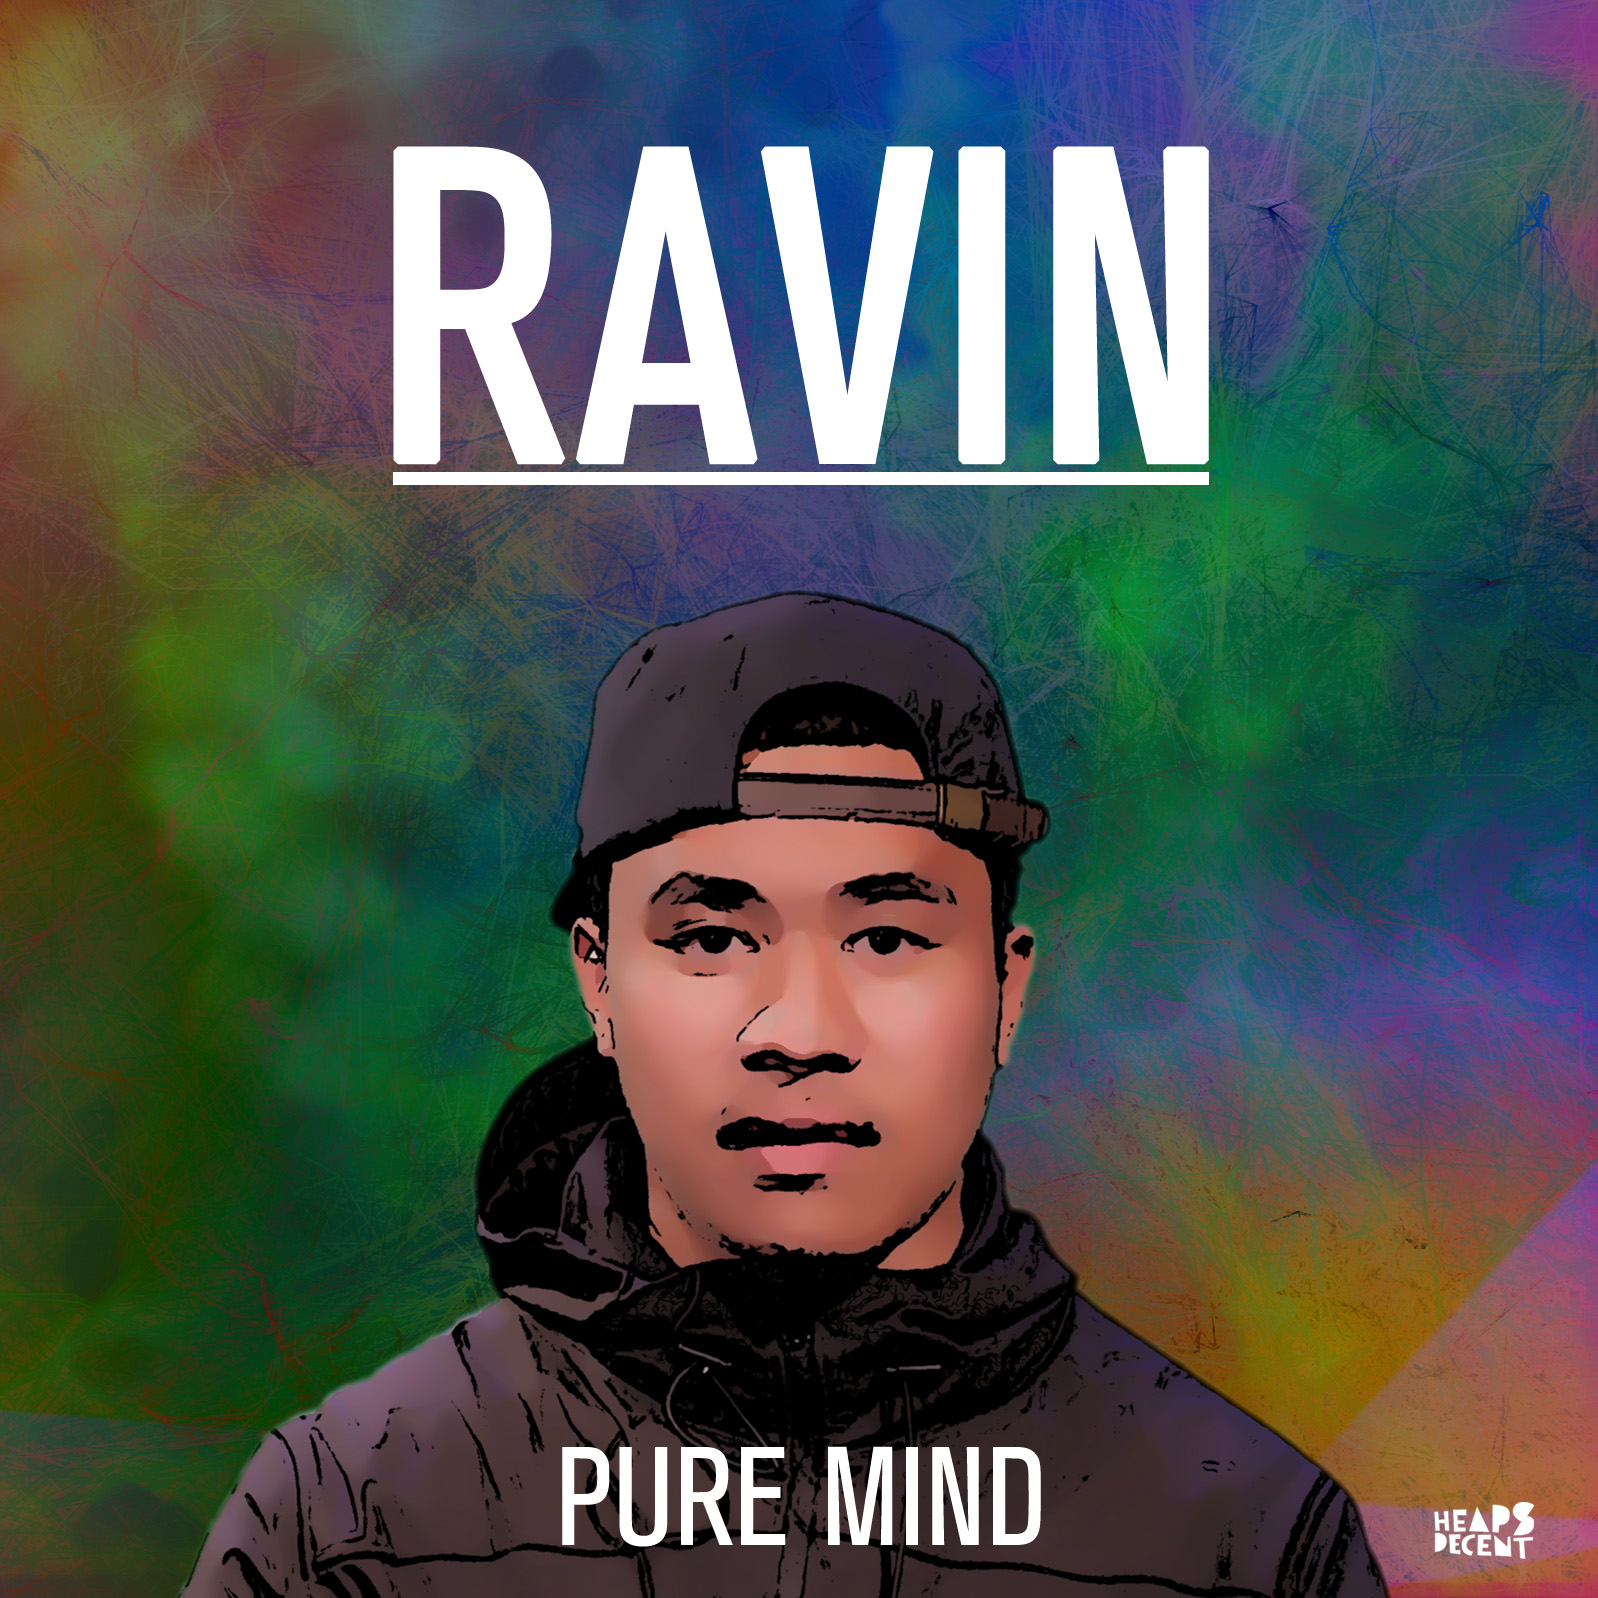 Ravin - Pure Mind